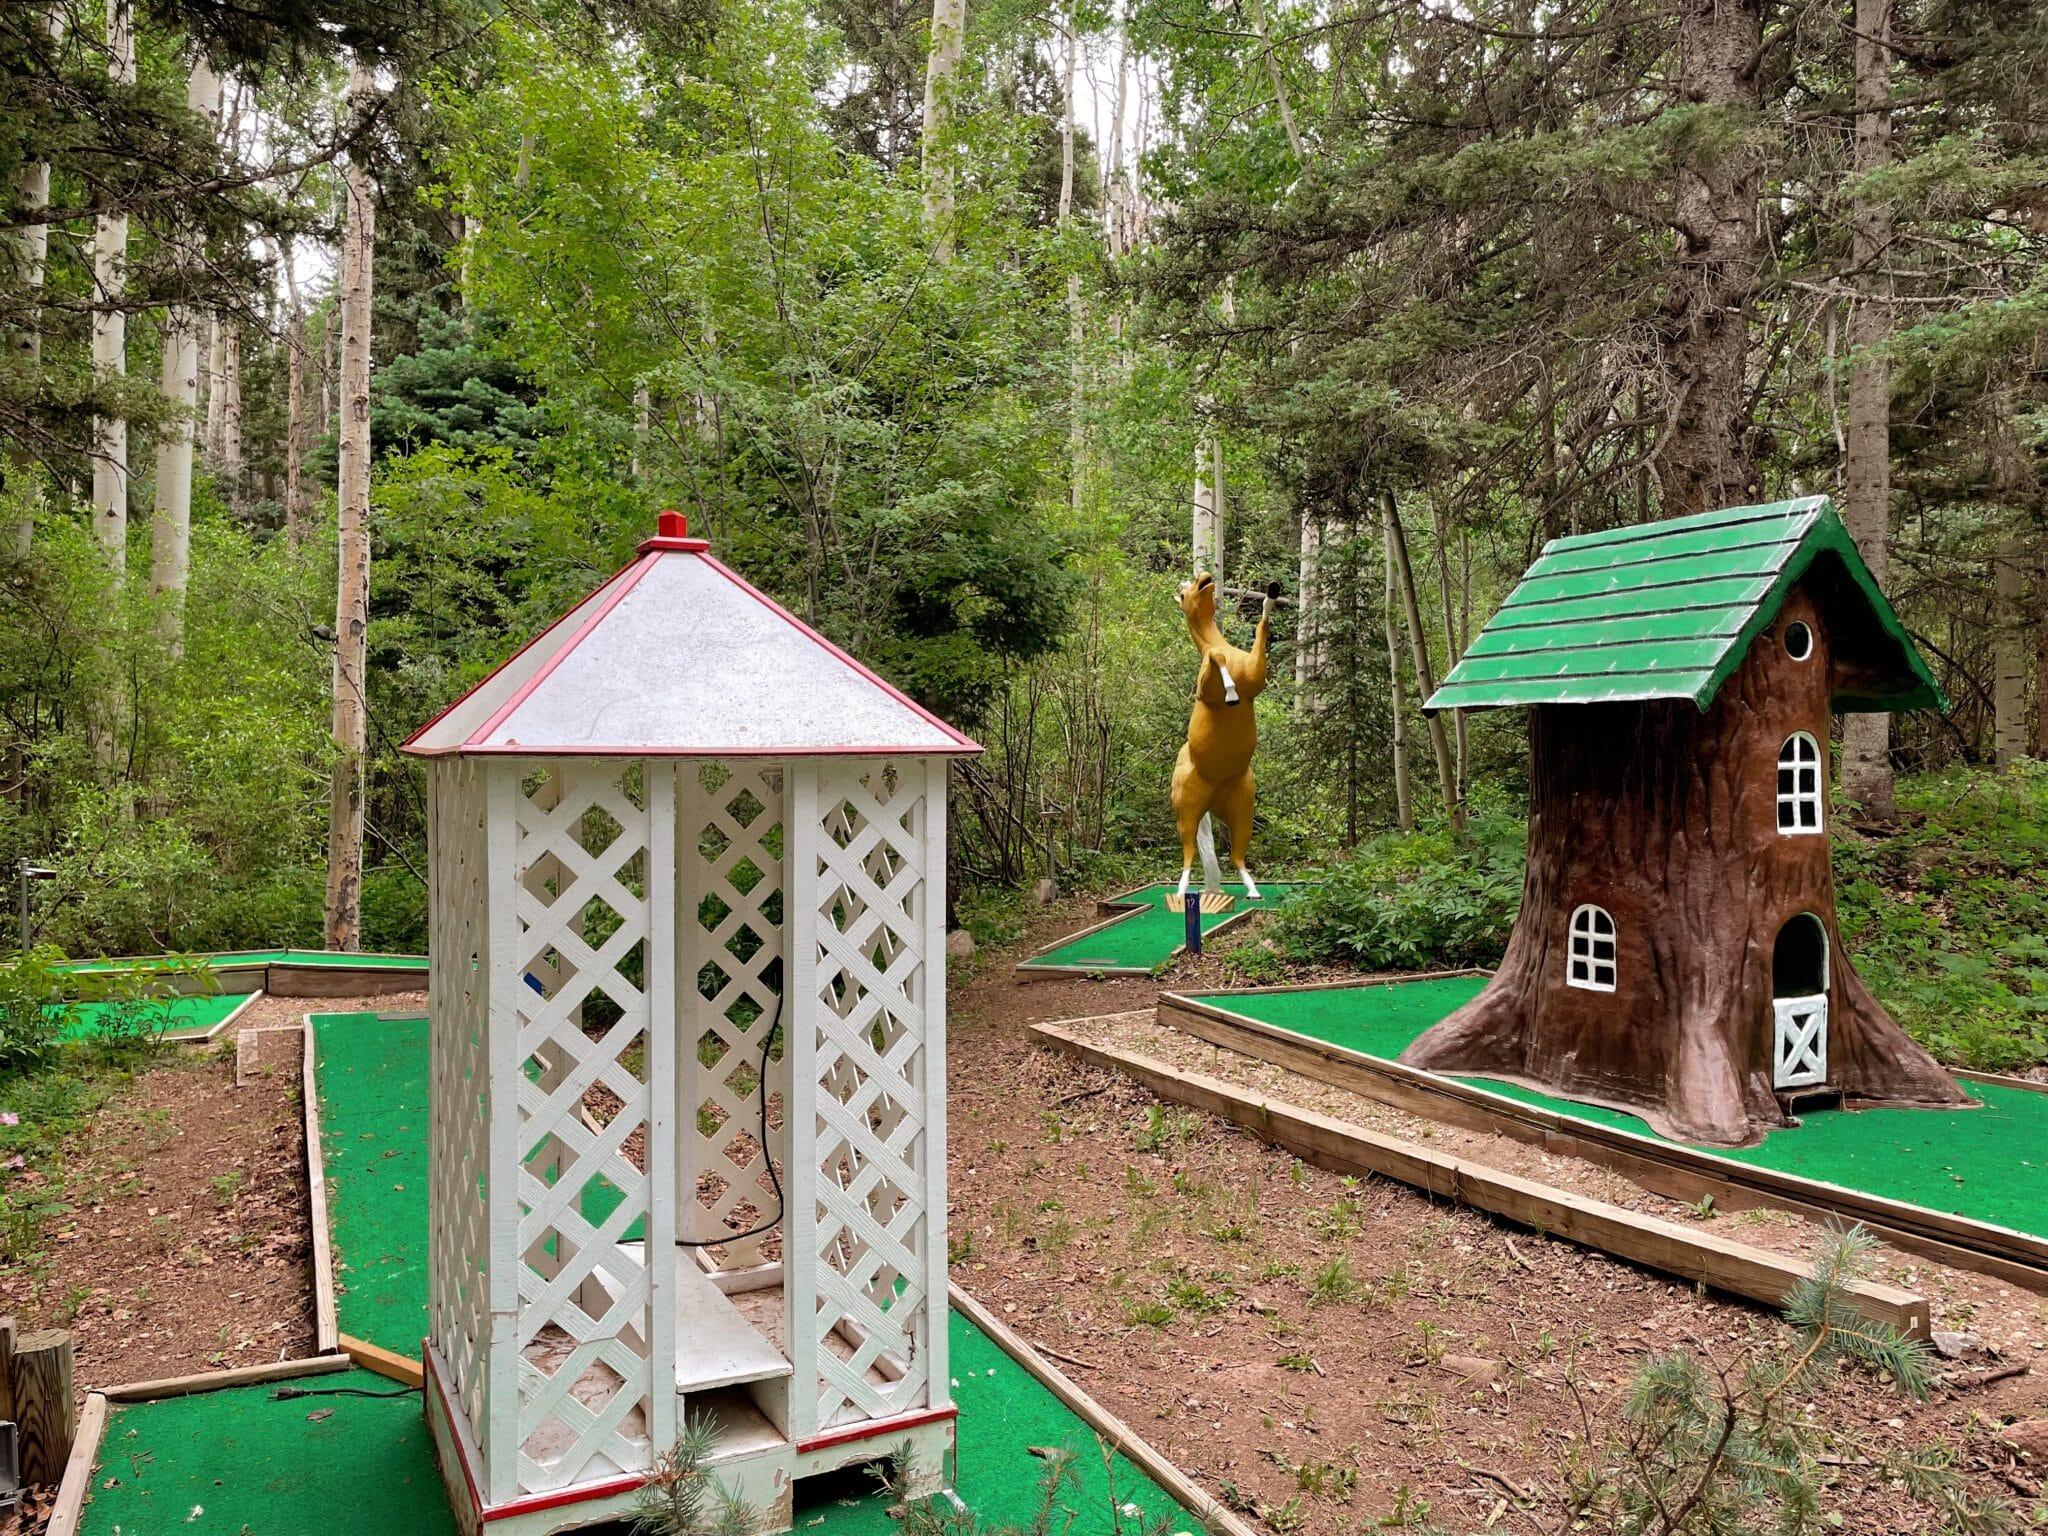 image of mini golf at cuchara mountain park